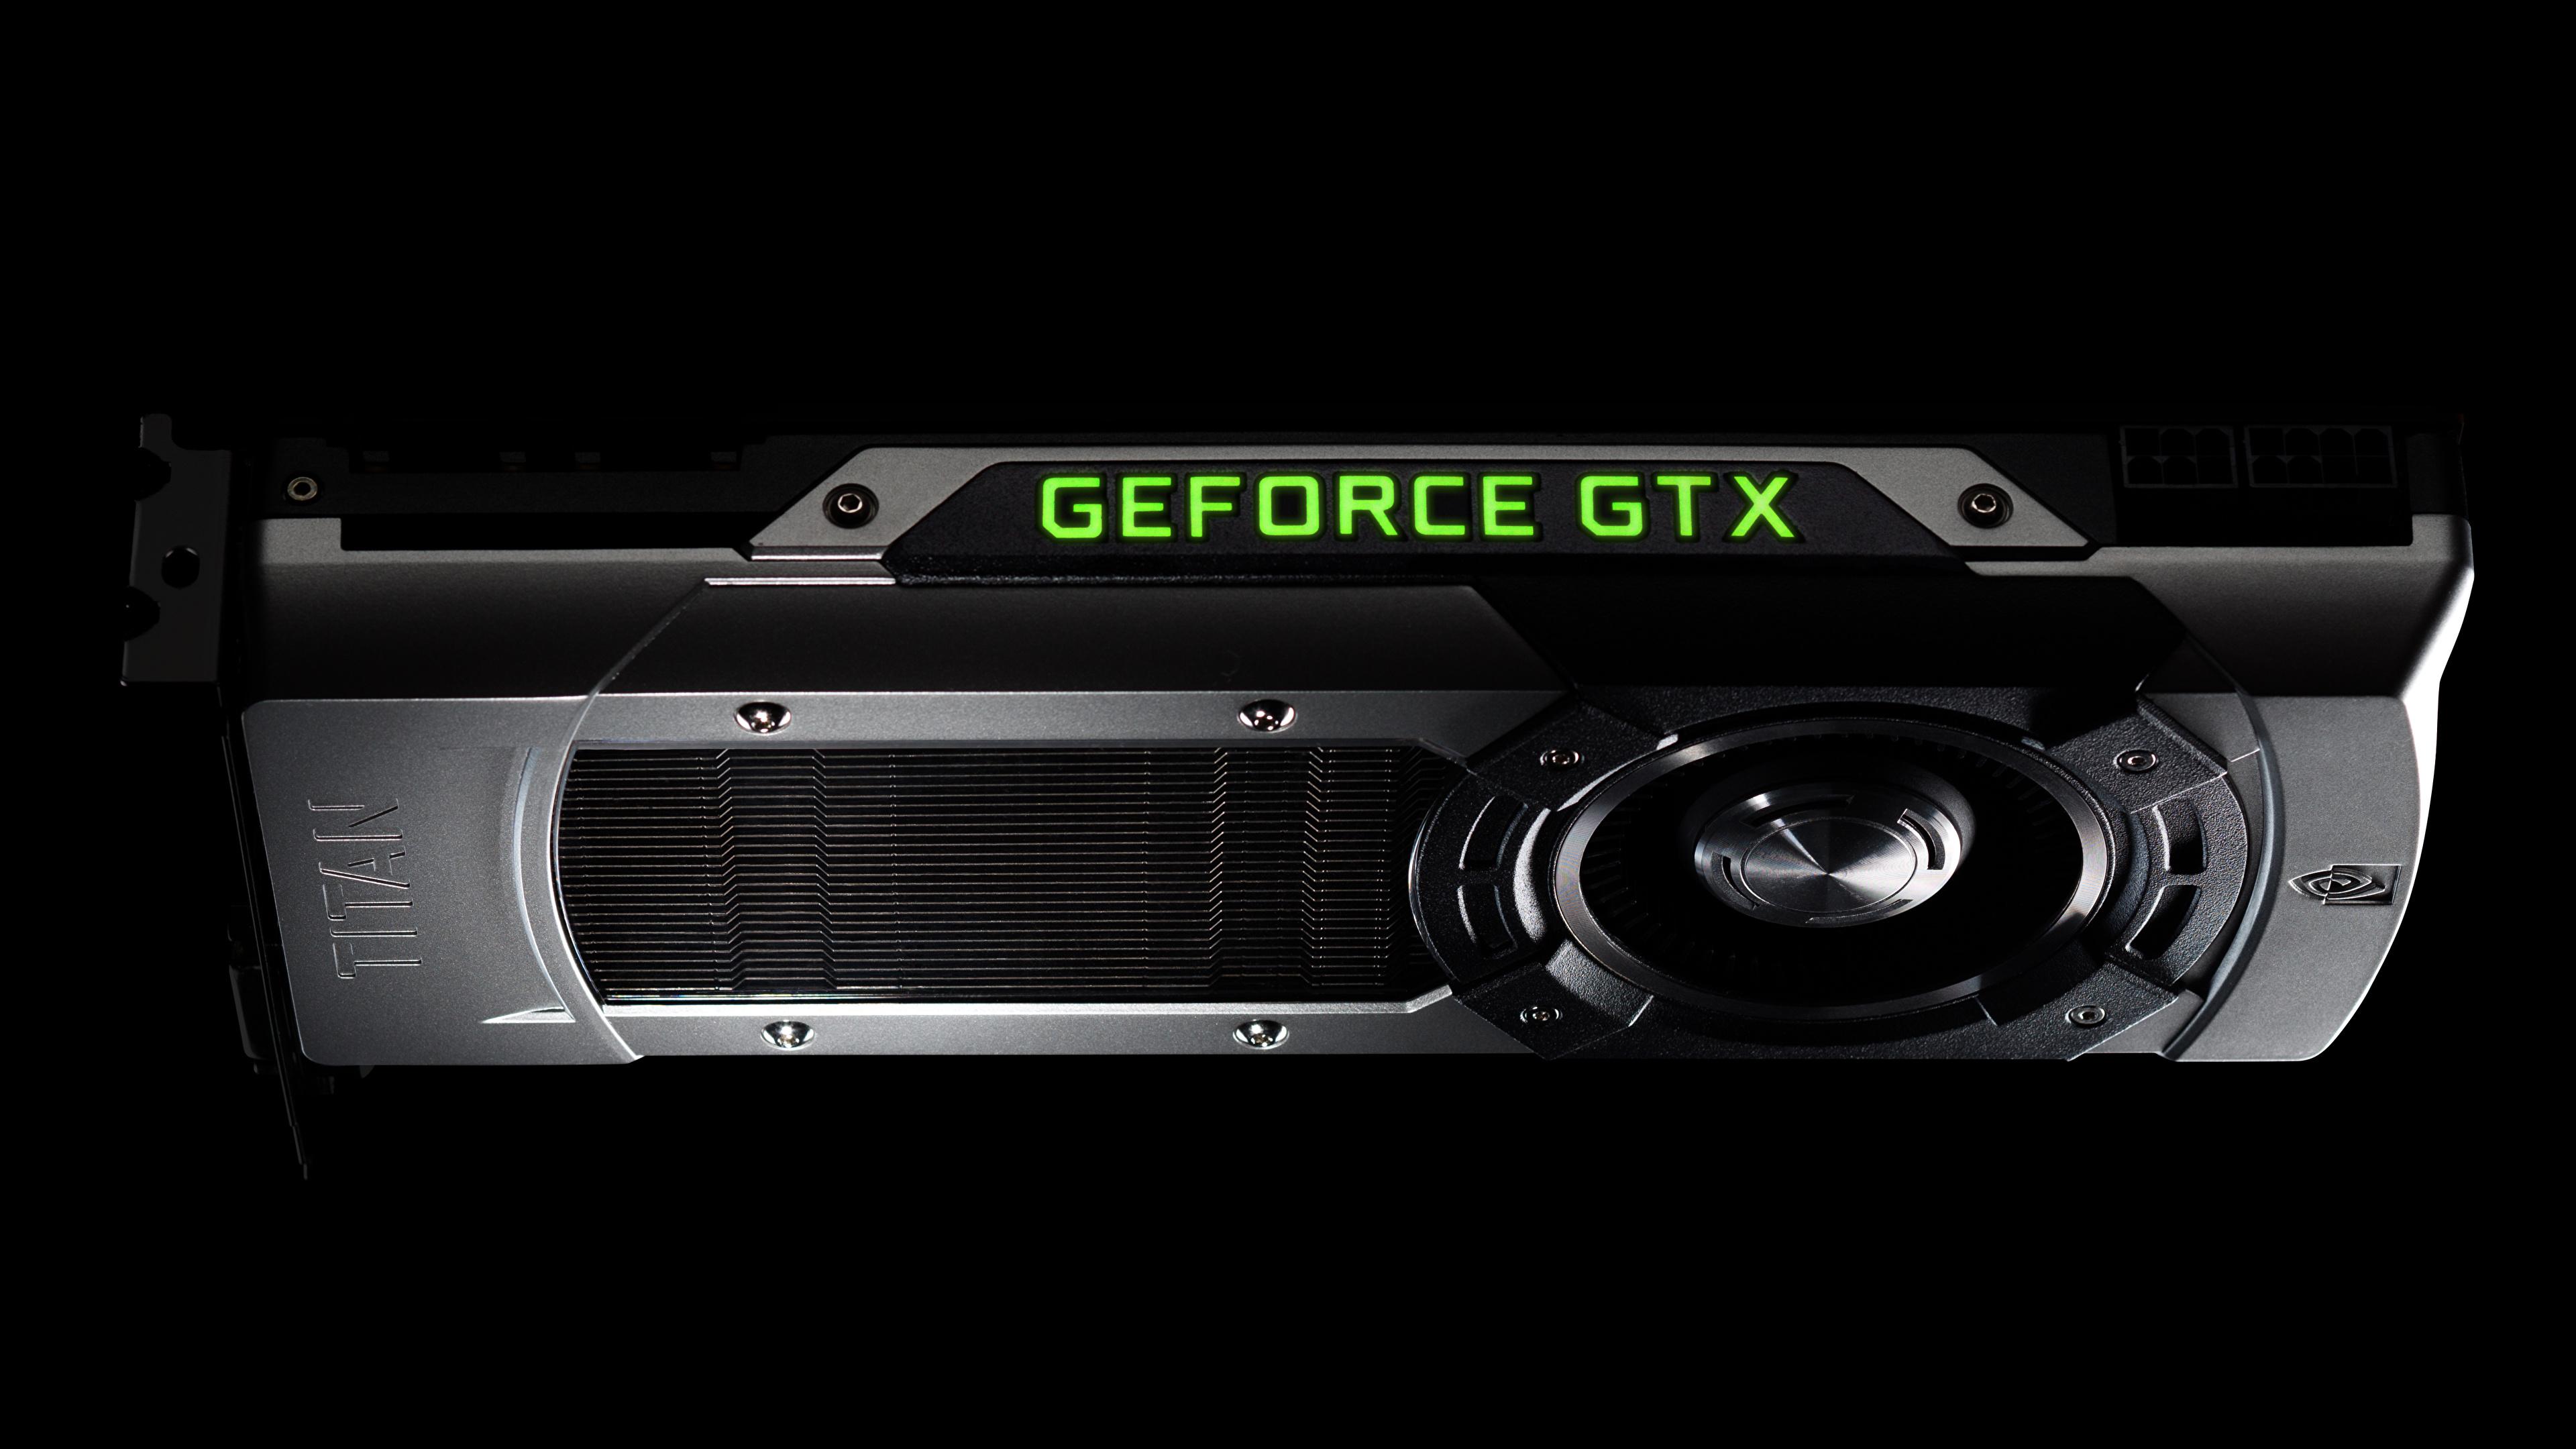 картинкикарта GTX 690 Nvidia без смс